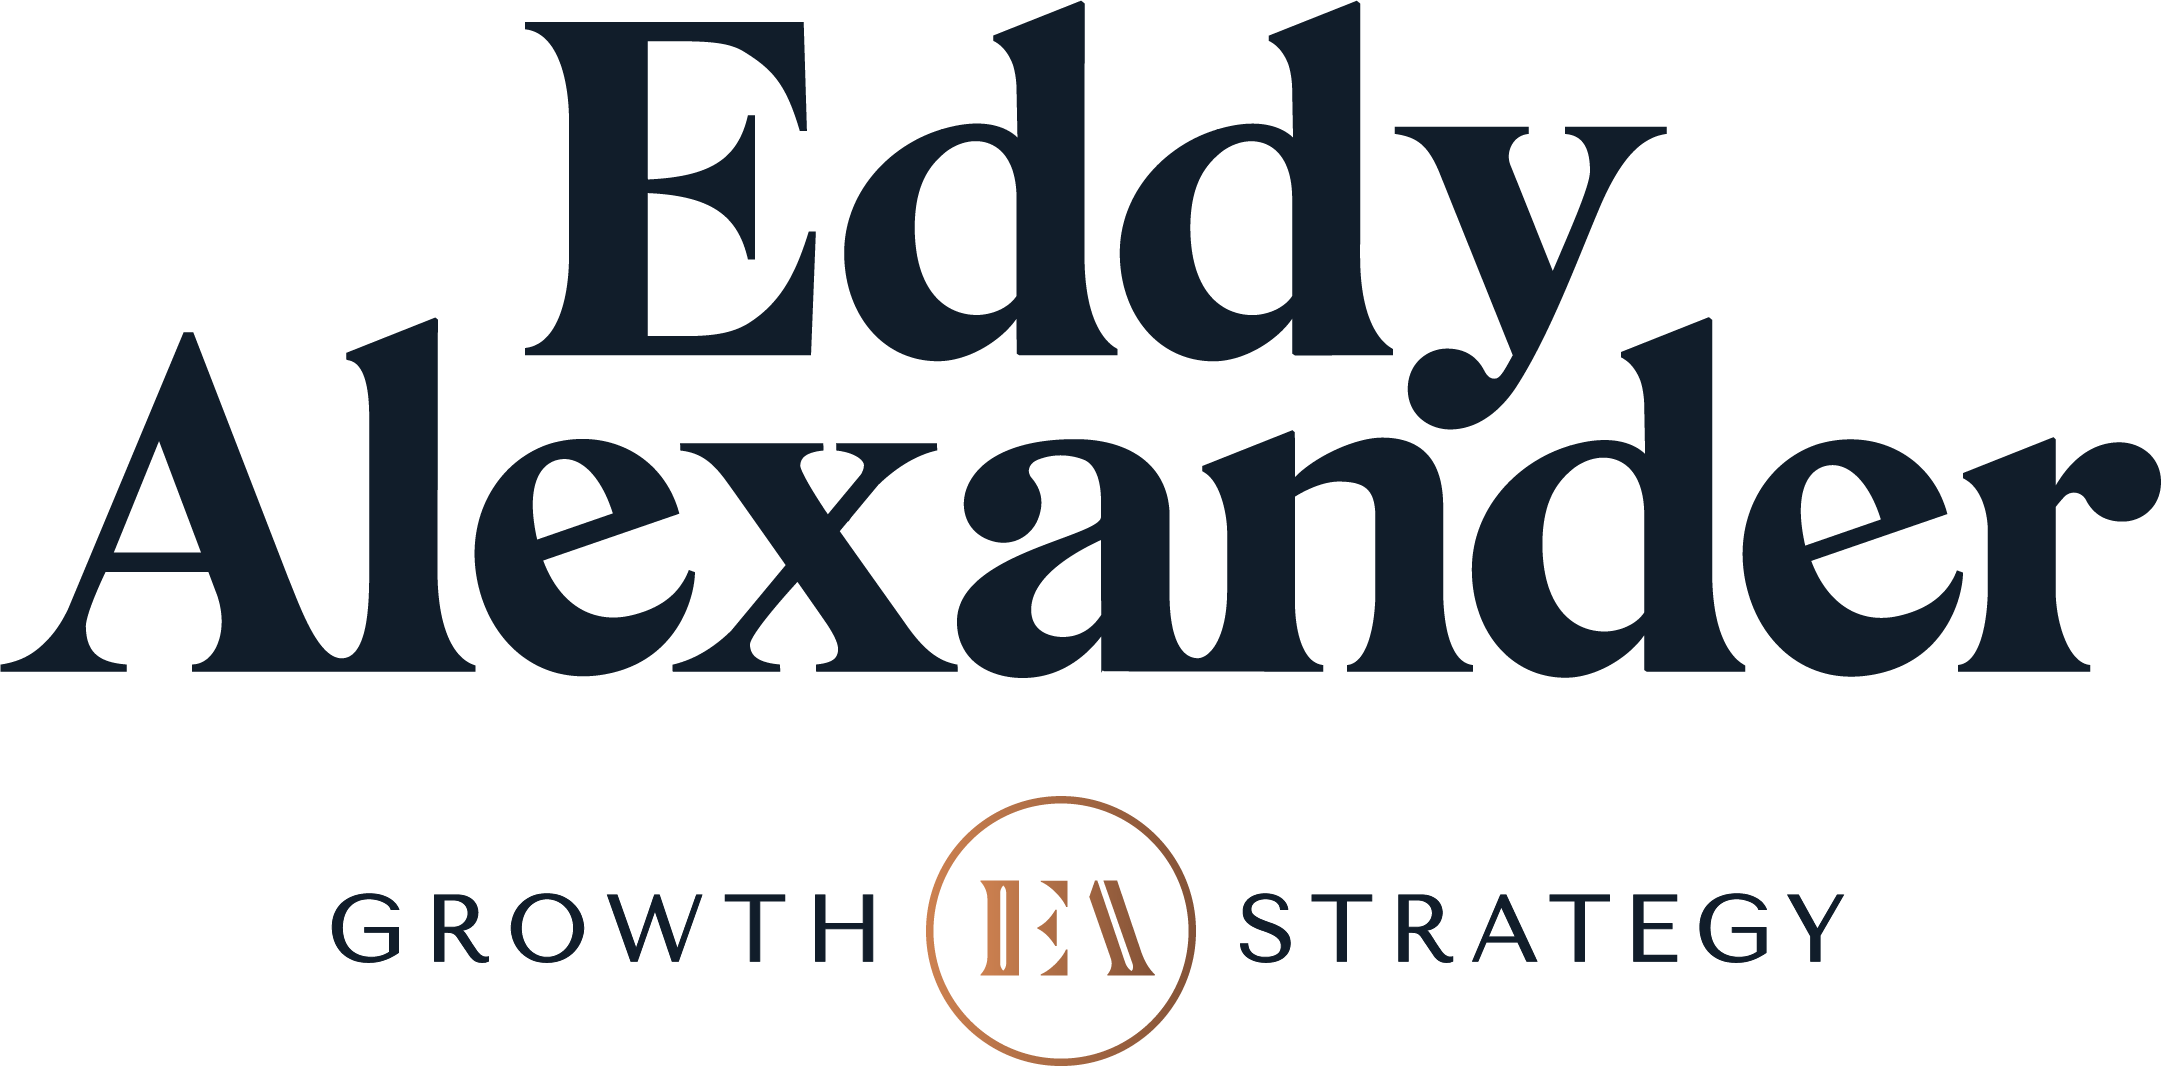 Eddy Alexander Stacked Logo hidden